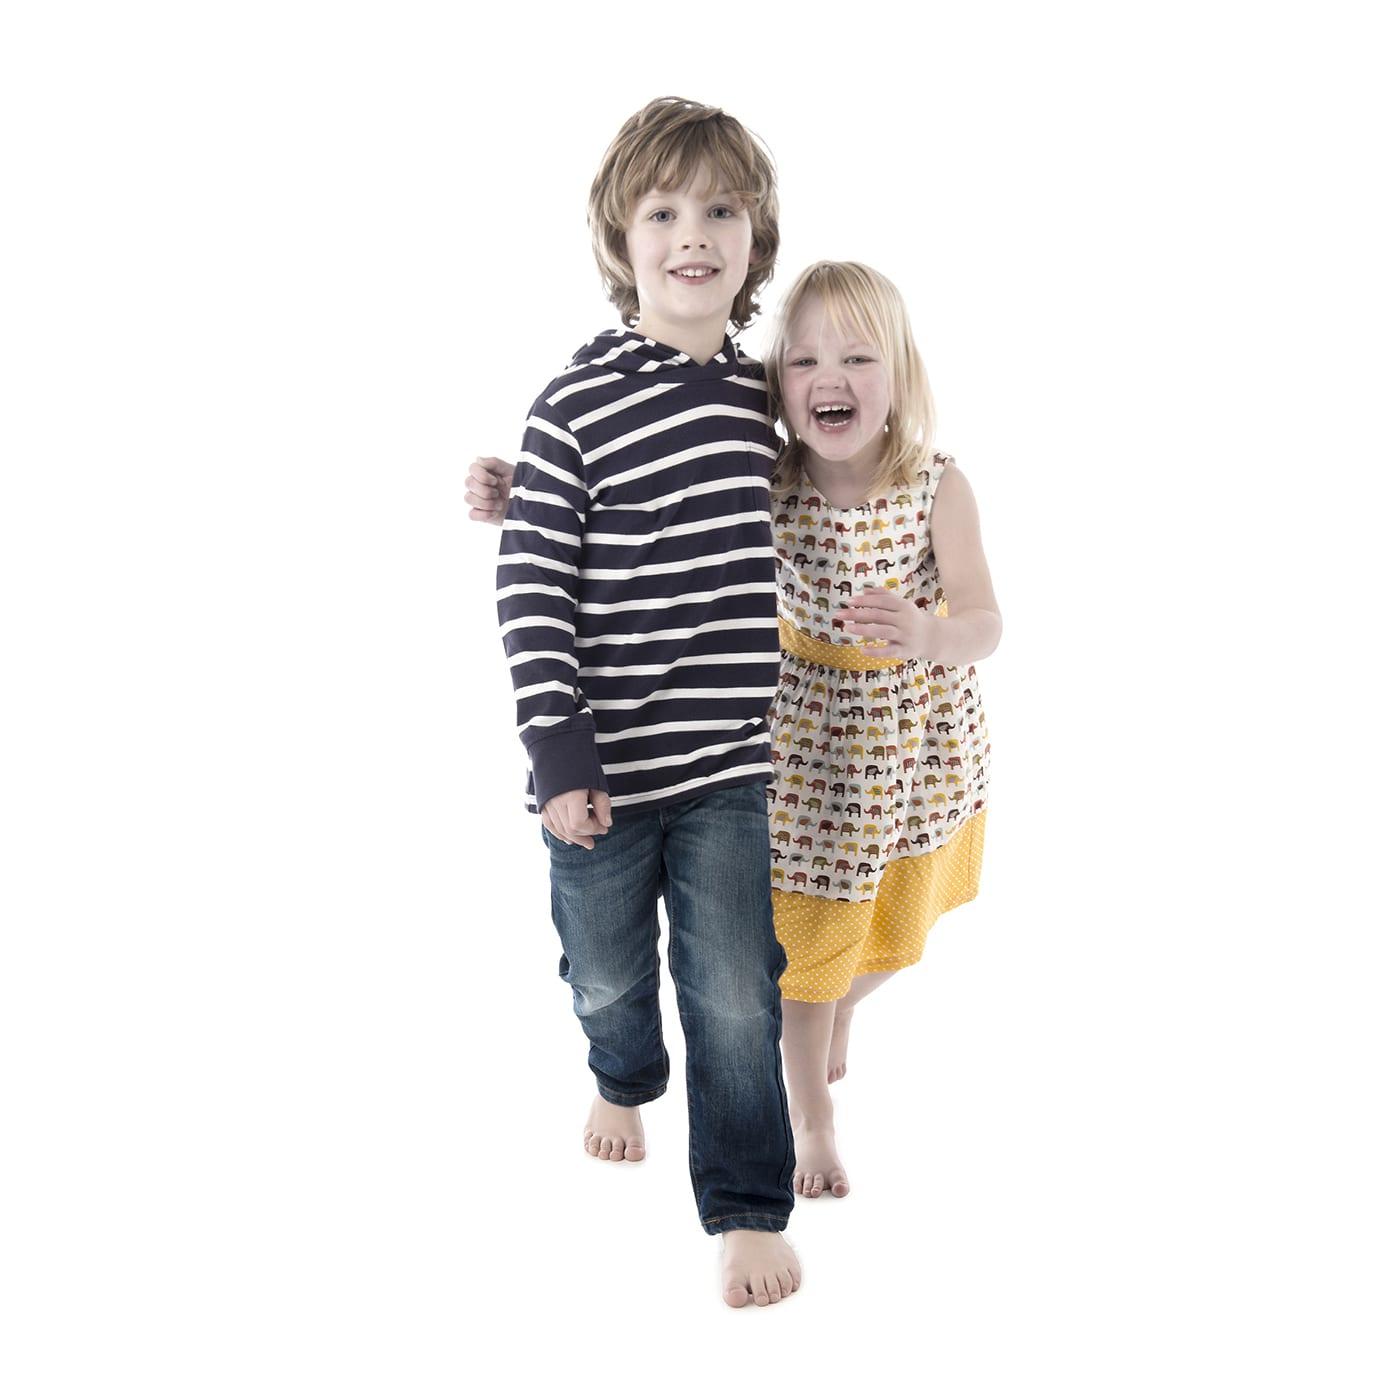 children-photos-twofrontteeth11